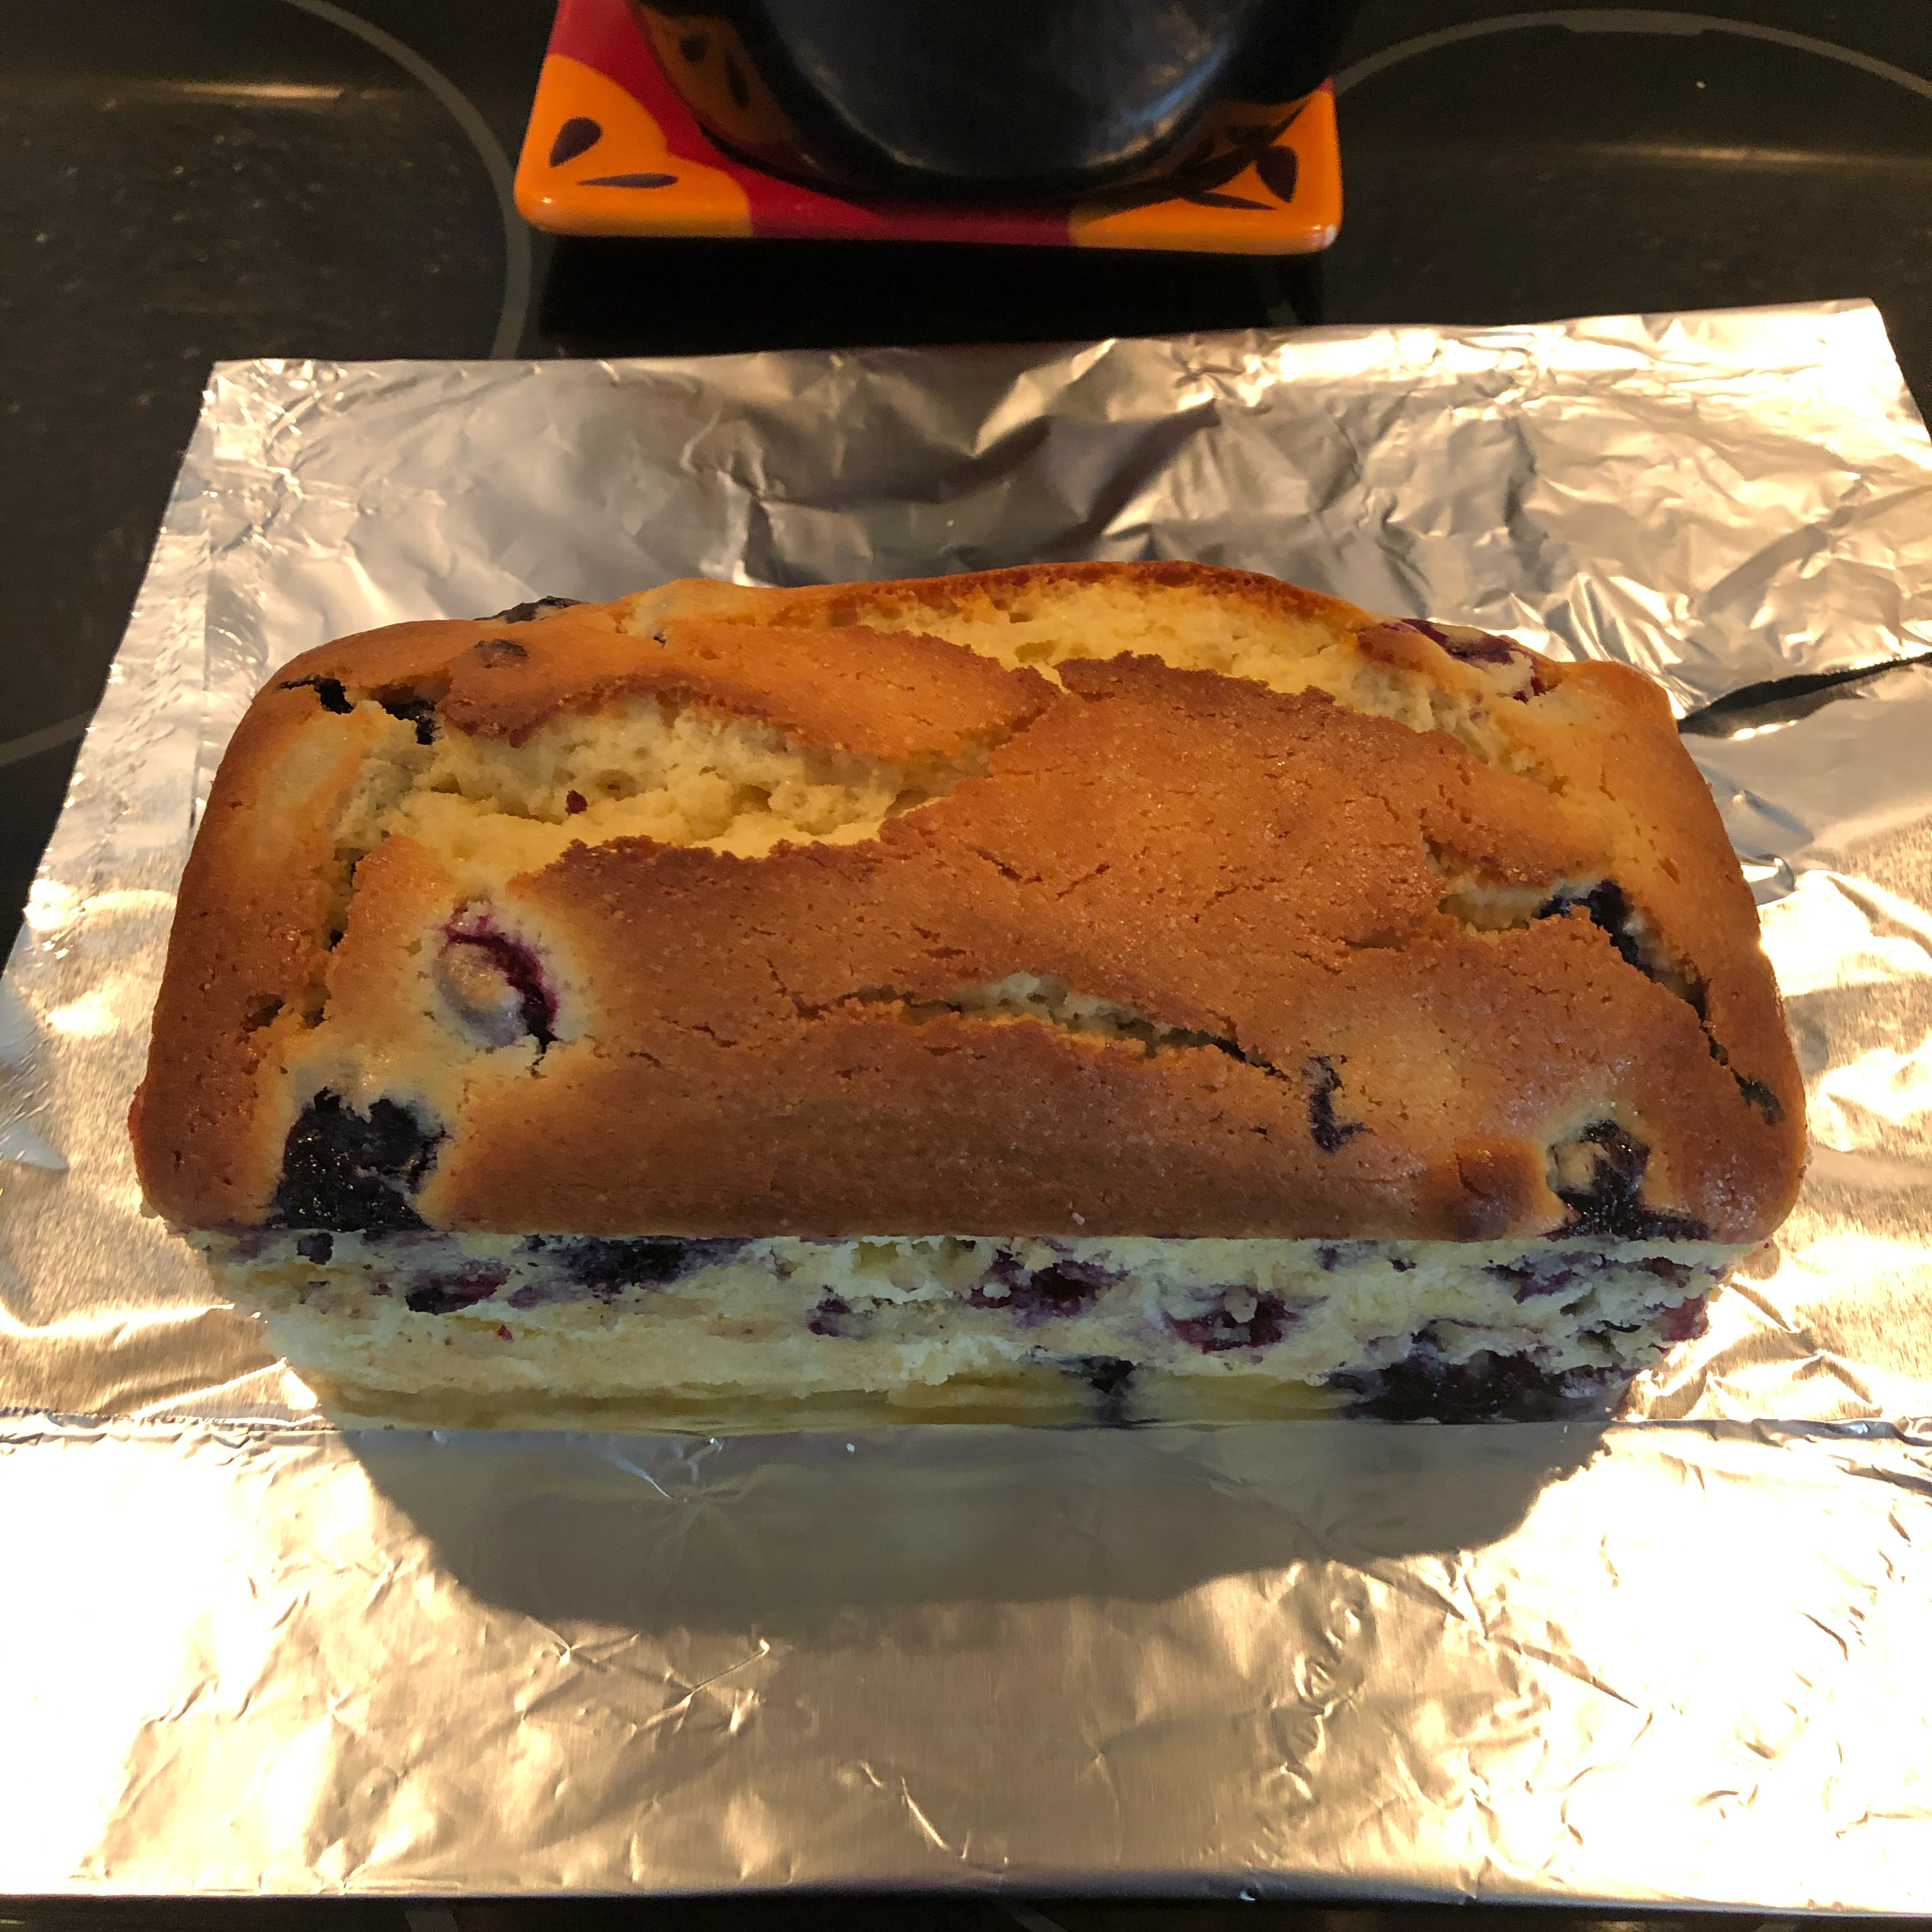 Lemon Blueberry Bread fwankendawg